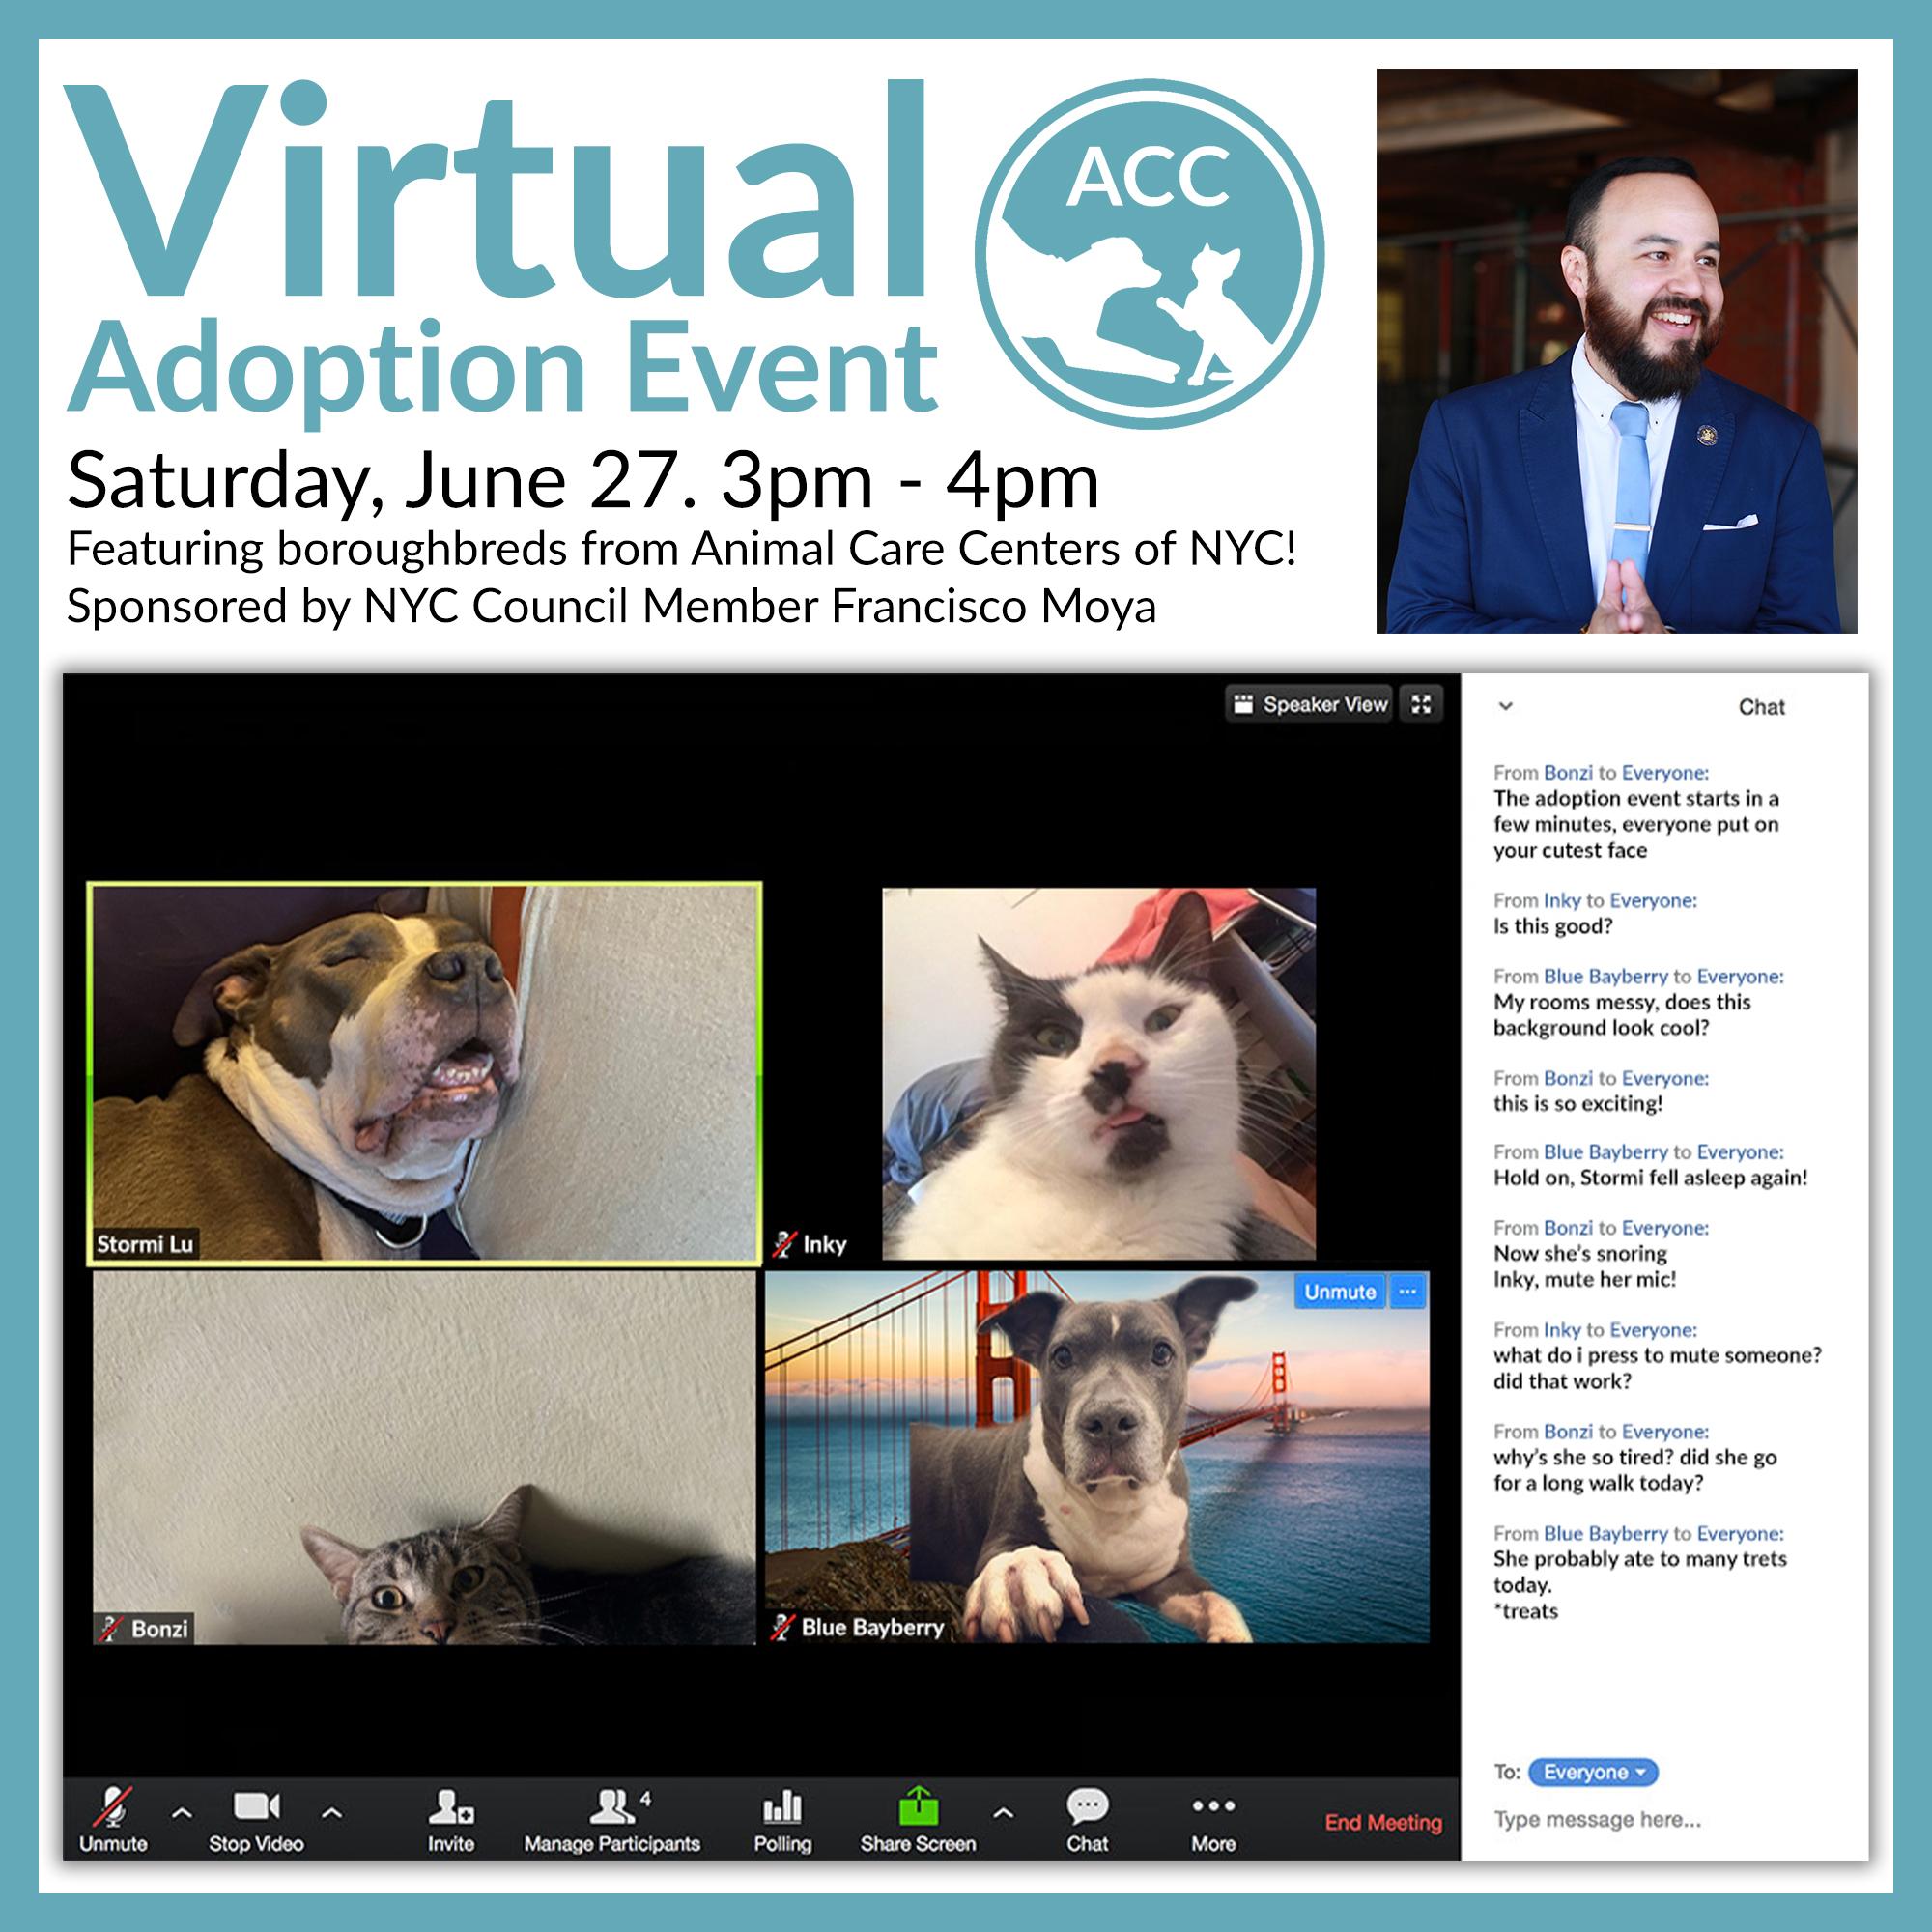 Virtual Adoption Event